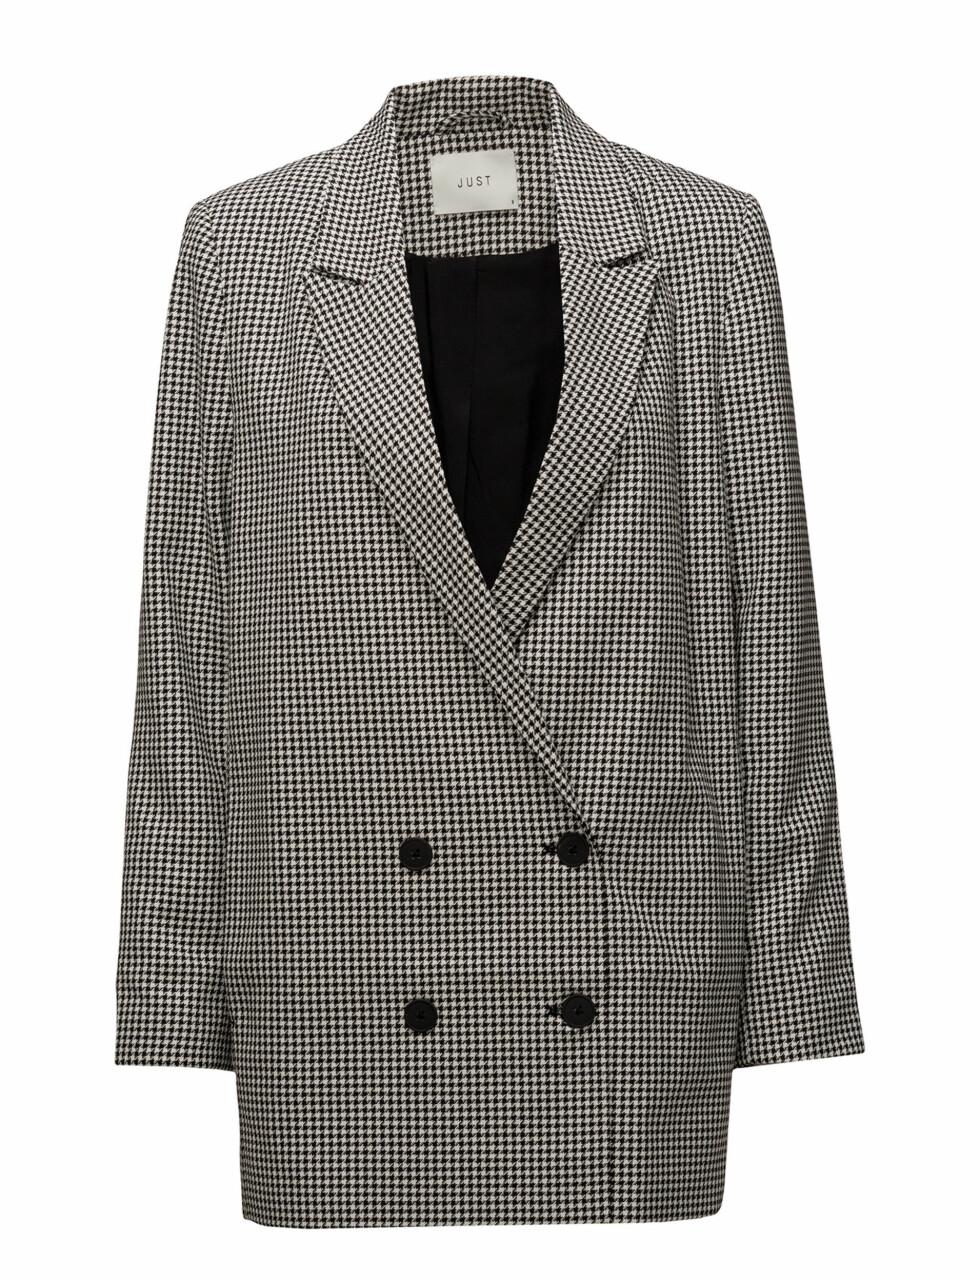 Blazer fra Just Female |1170,-| https://www.boozt.com/no/no/just-female-ob/amalie-blazer_17204985/17204986?path=67363&navId=67363&sNavId=67450&group=listing&position=1000000